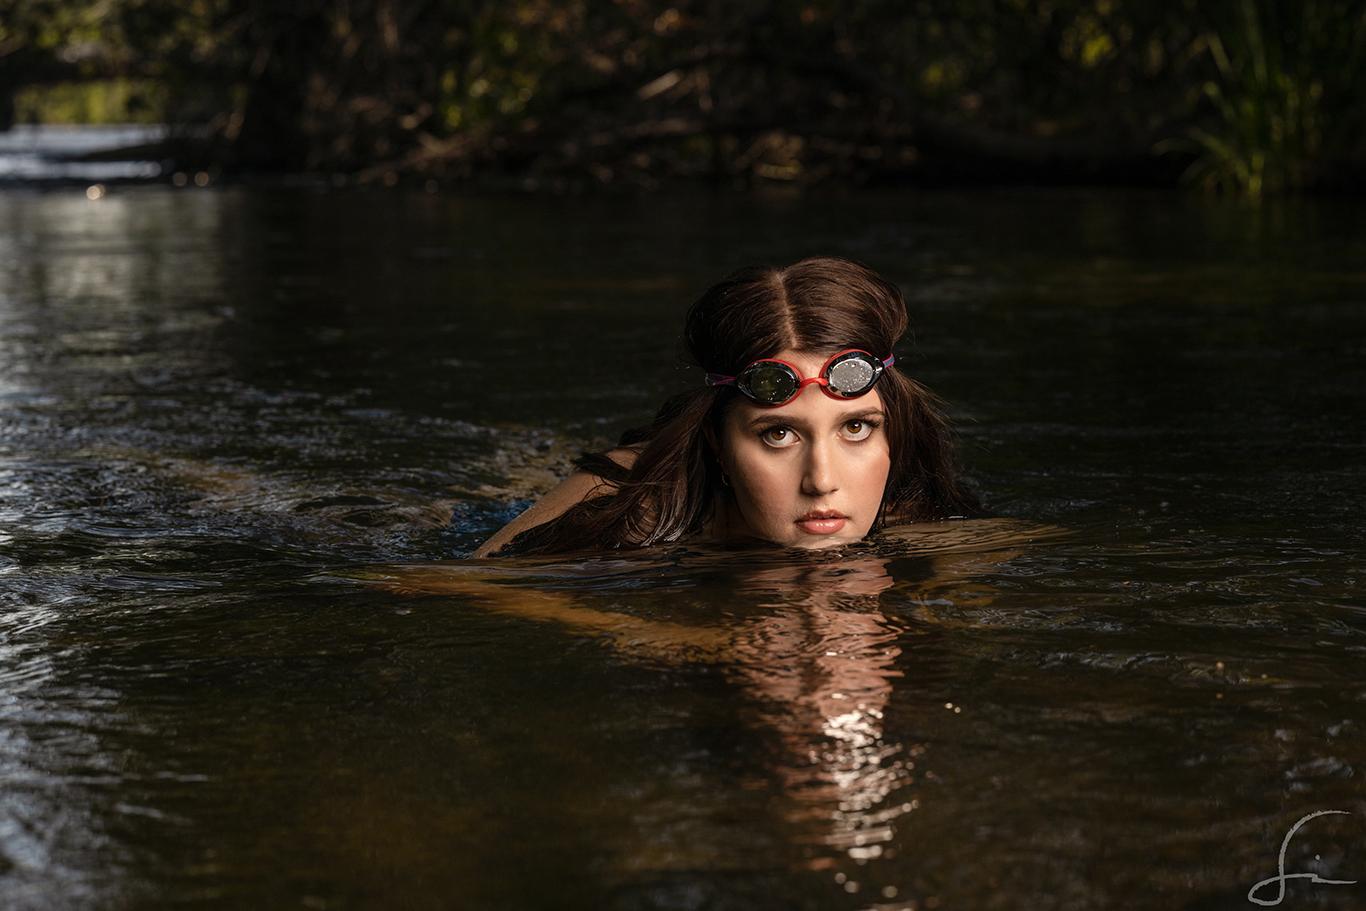 high school senior swimmer in the Boise River for her senior Portraits by Samuel Marvin Photography